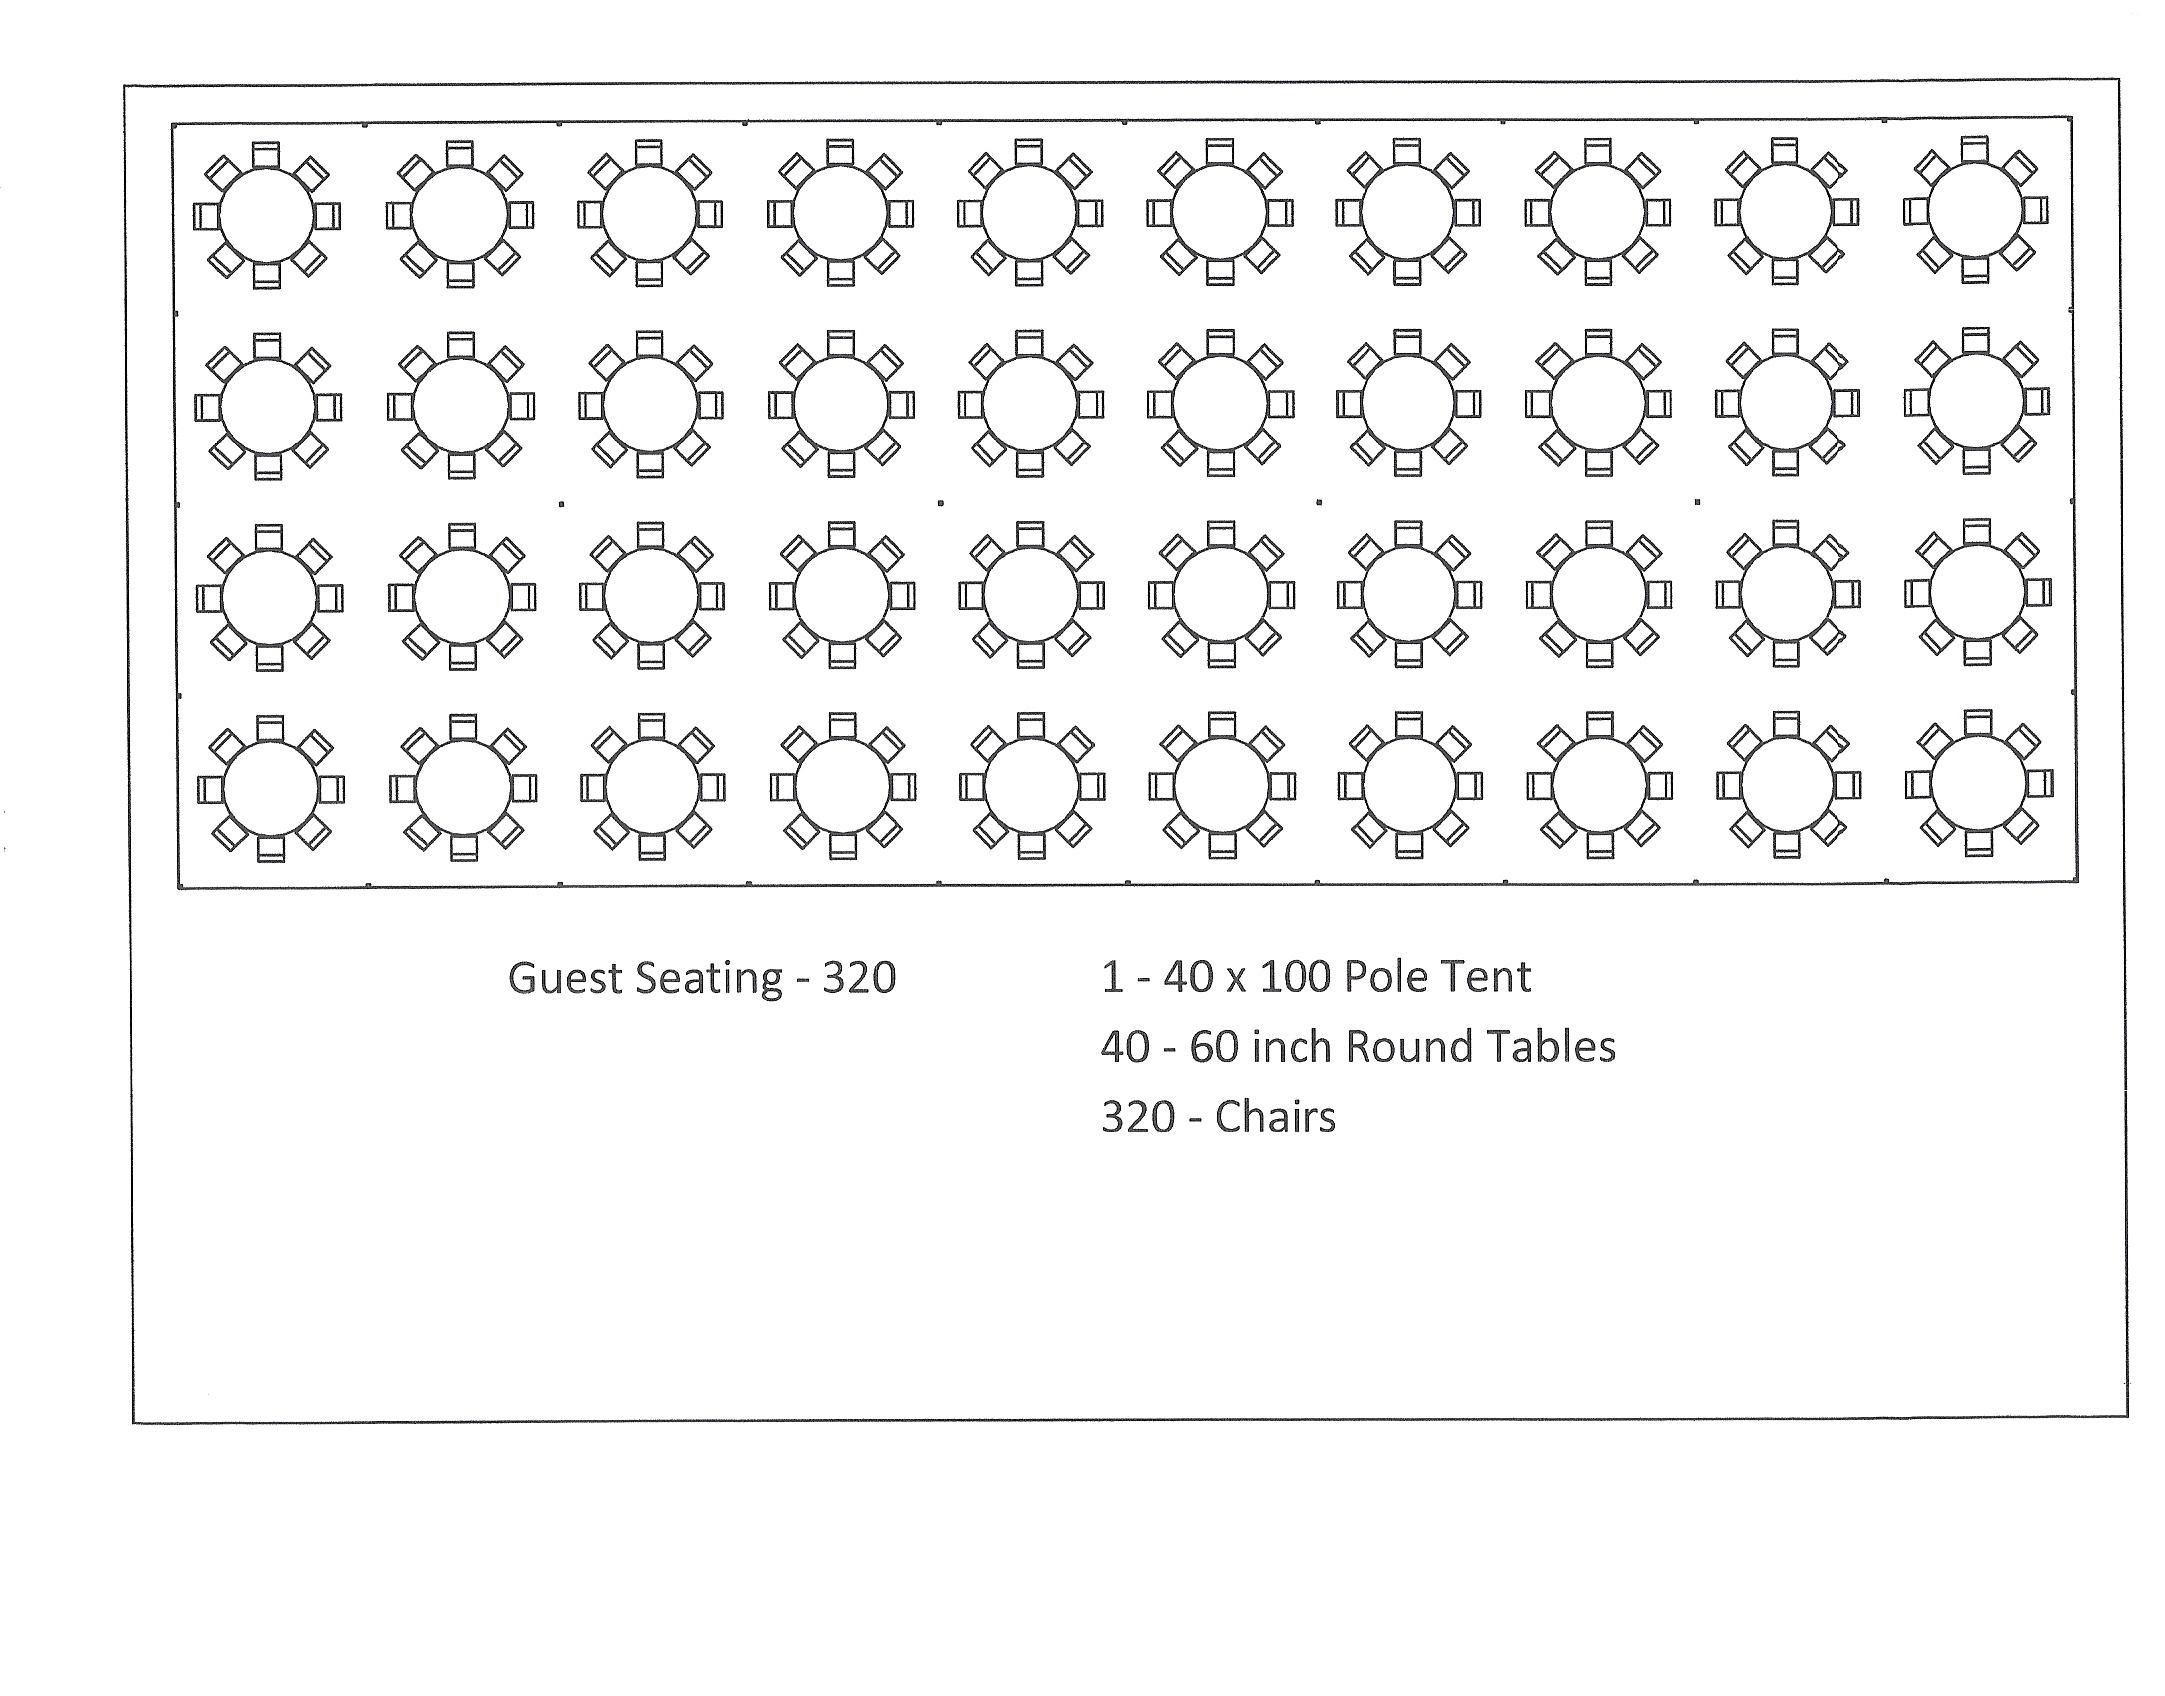 40 X 100 Pole Tent Seating Arrangement